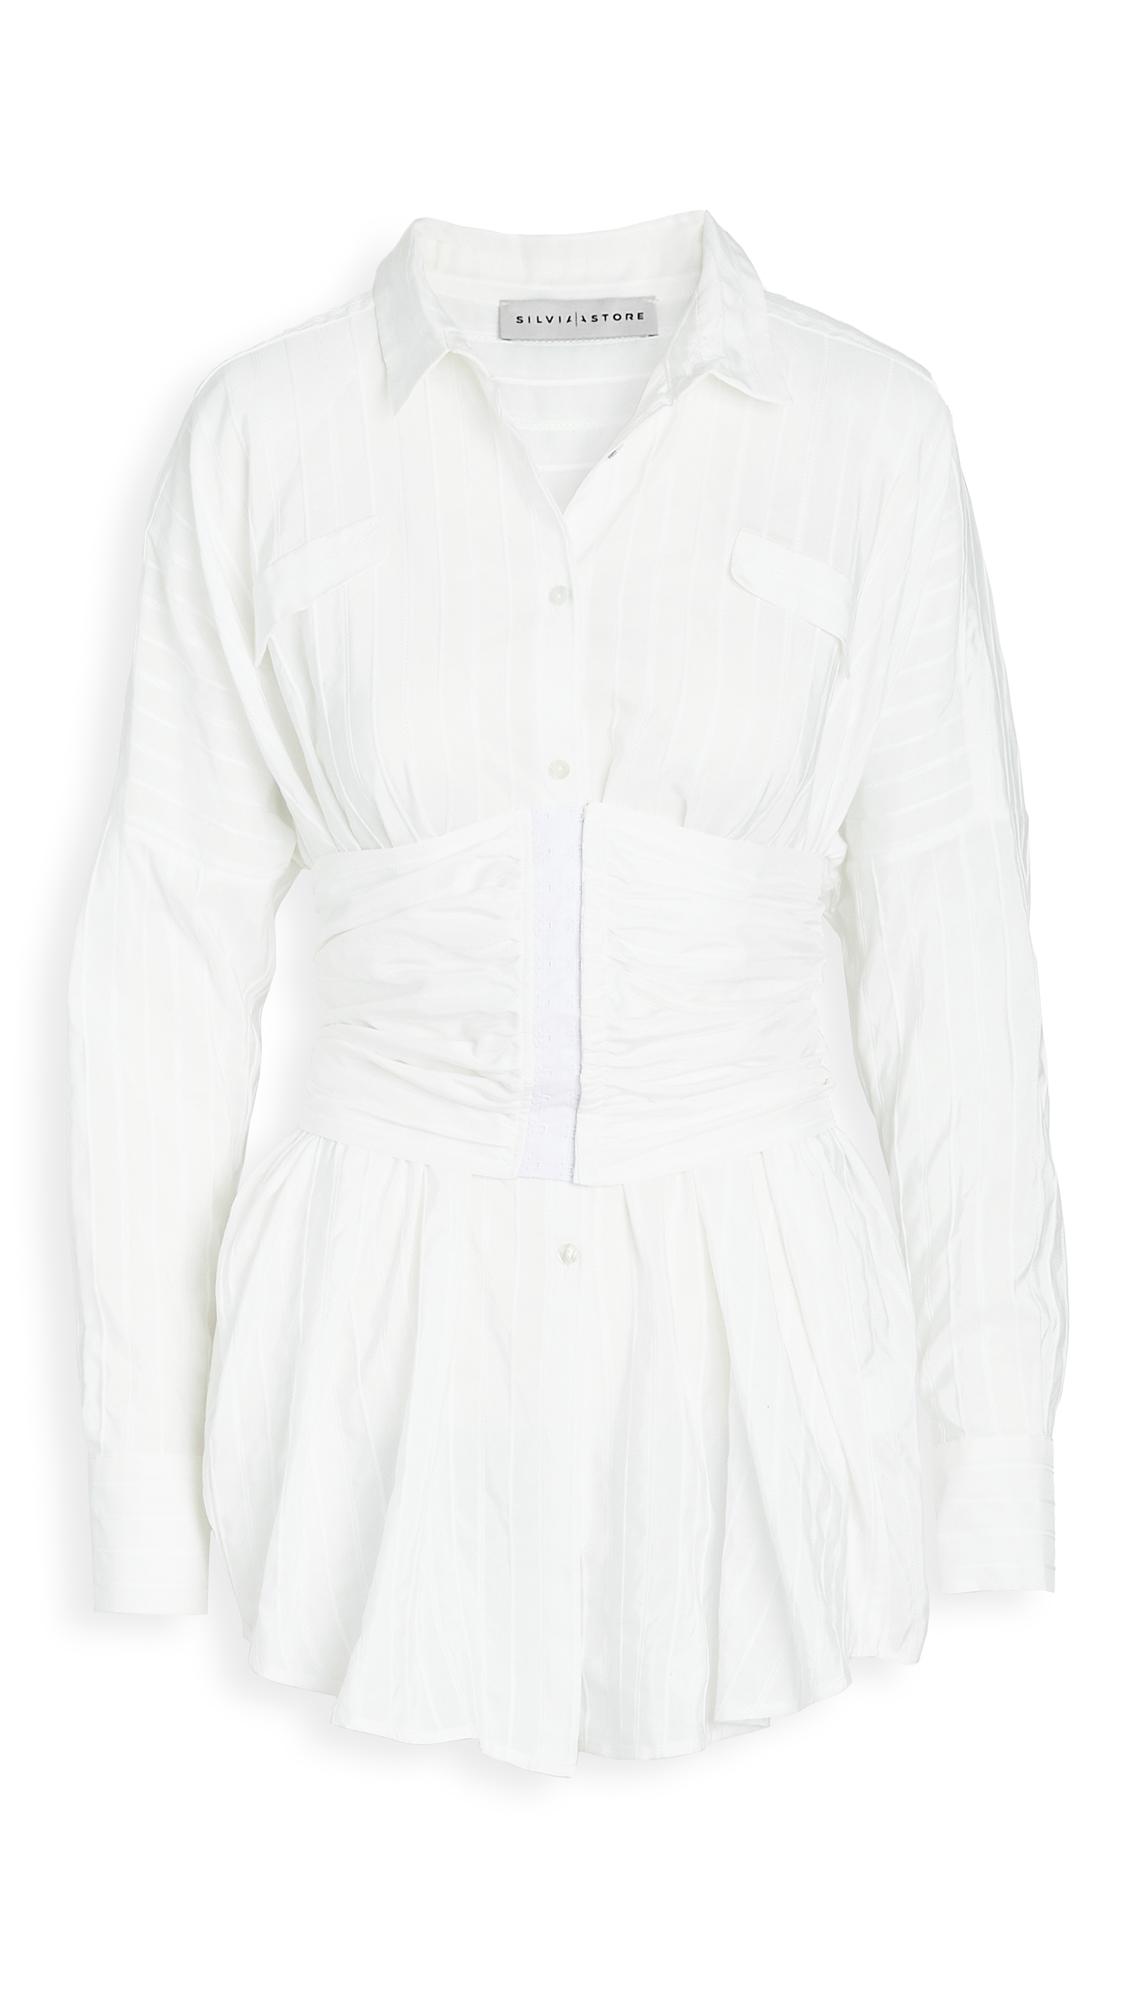 Silvia Astore Ambra Shirt - 30% Off Sale